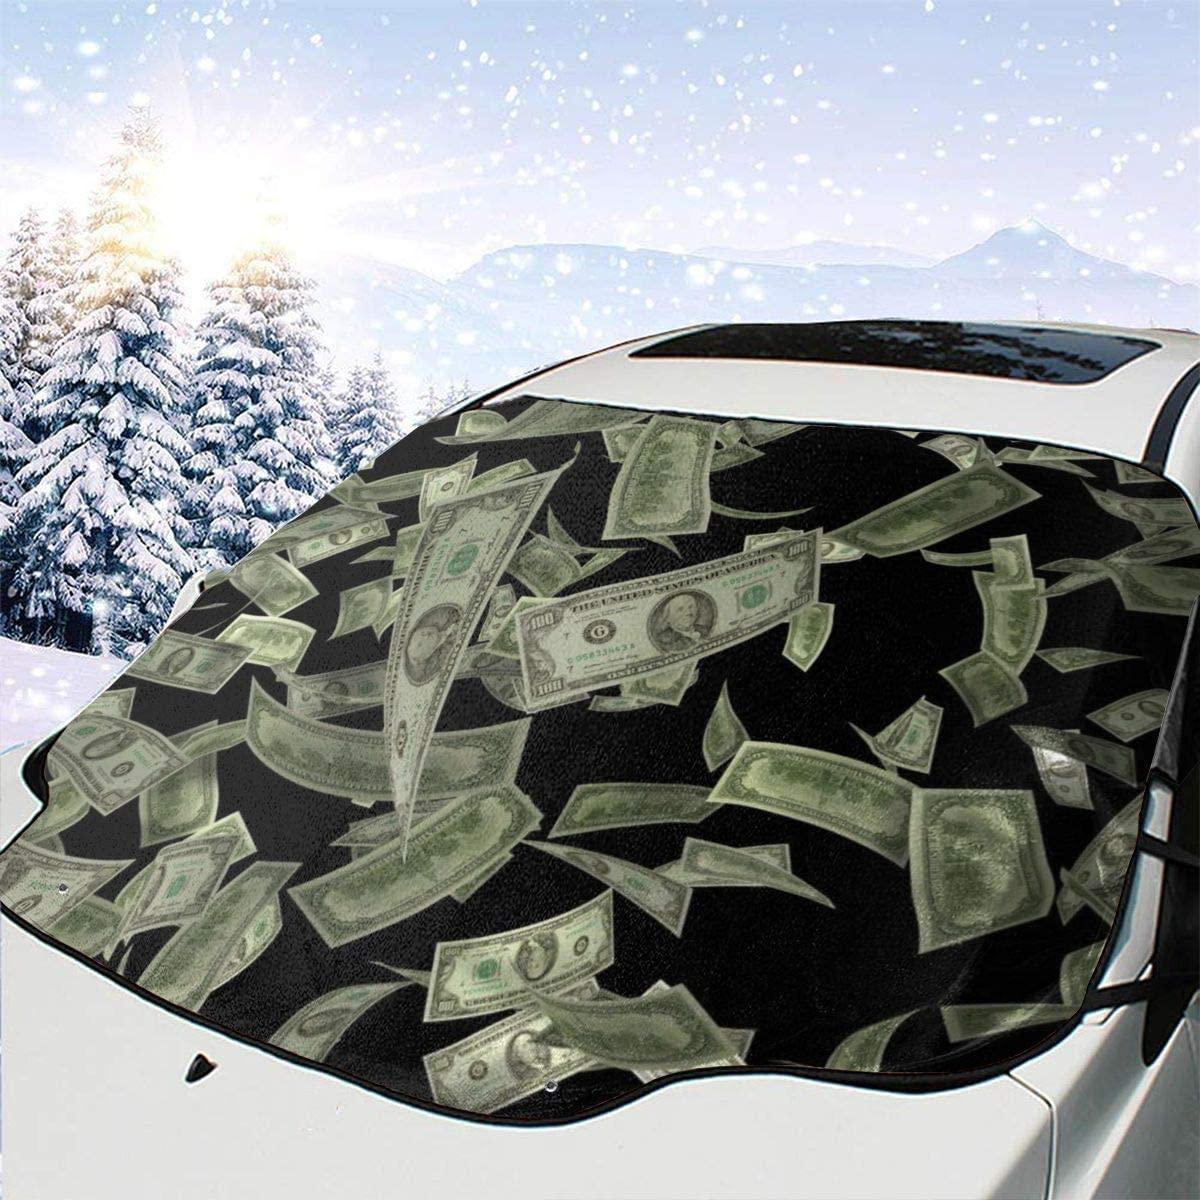 THONFIRE Car Front Window Windshield Winter Sunshade Dollar Cover Sand Proof Blocks UV Rays Keeps Your Vehicle Cool Visor Protector Trucks Summer Heat Insulation